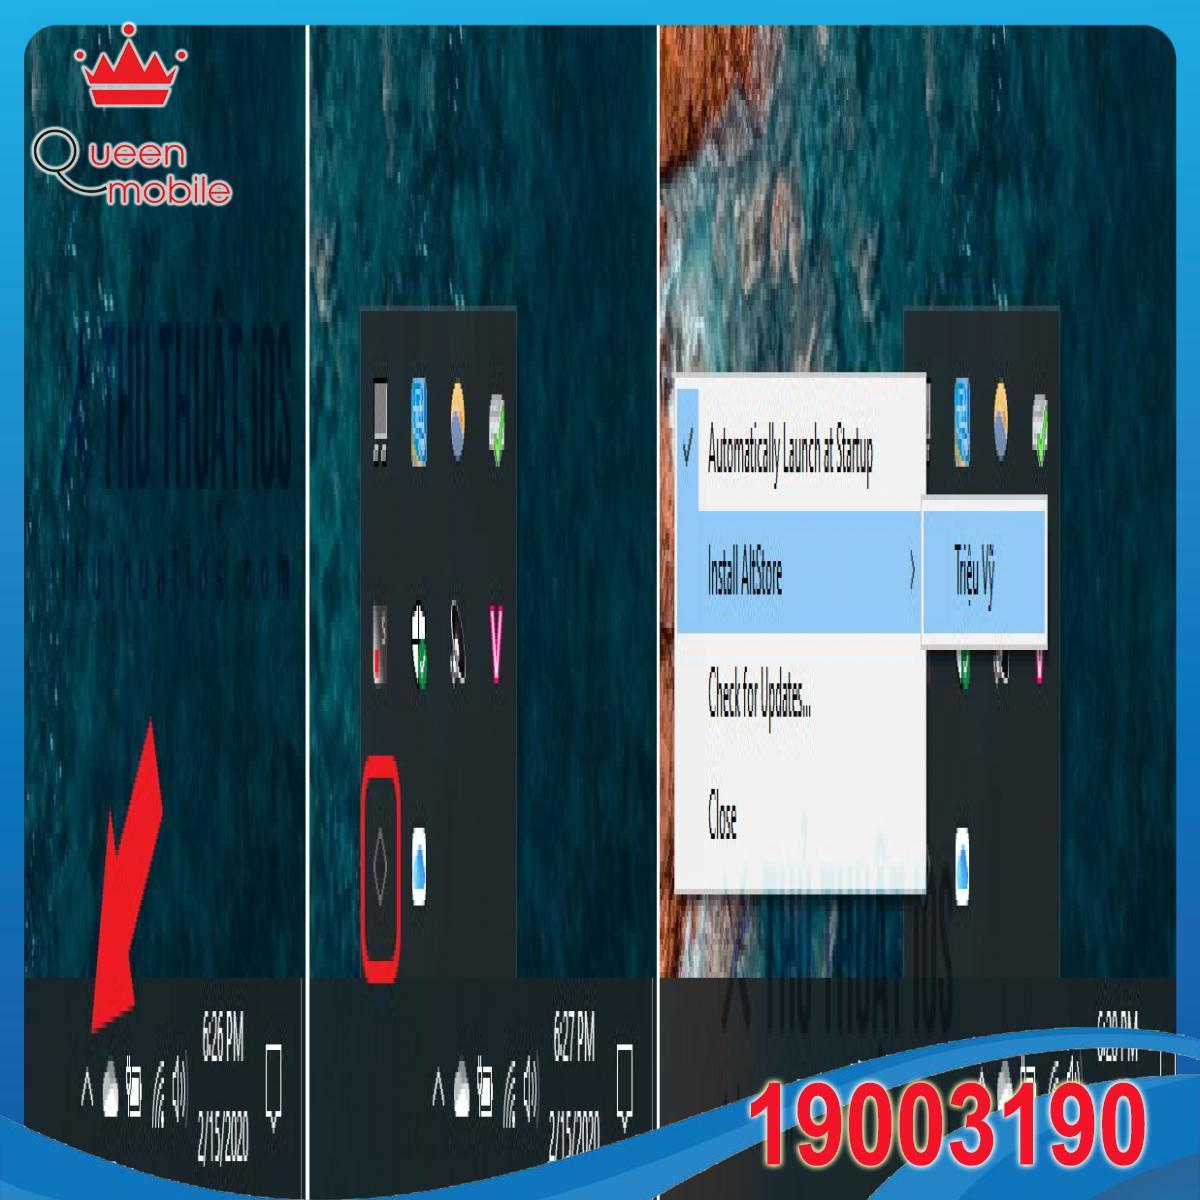 Hướng dẫn jailbreak iOS 13.0 – 13.3 (chip A12-A13) bằng unc0ver